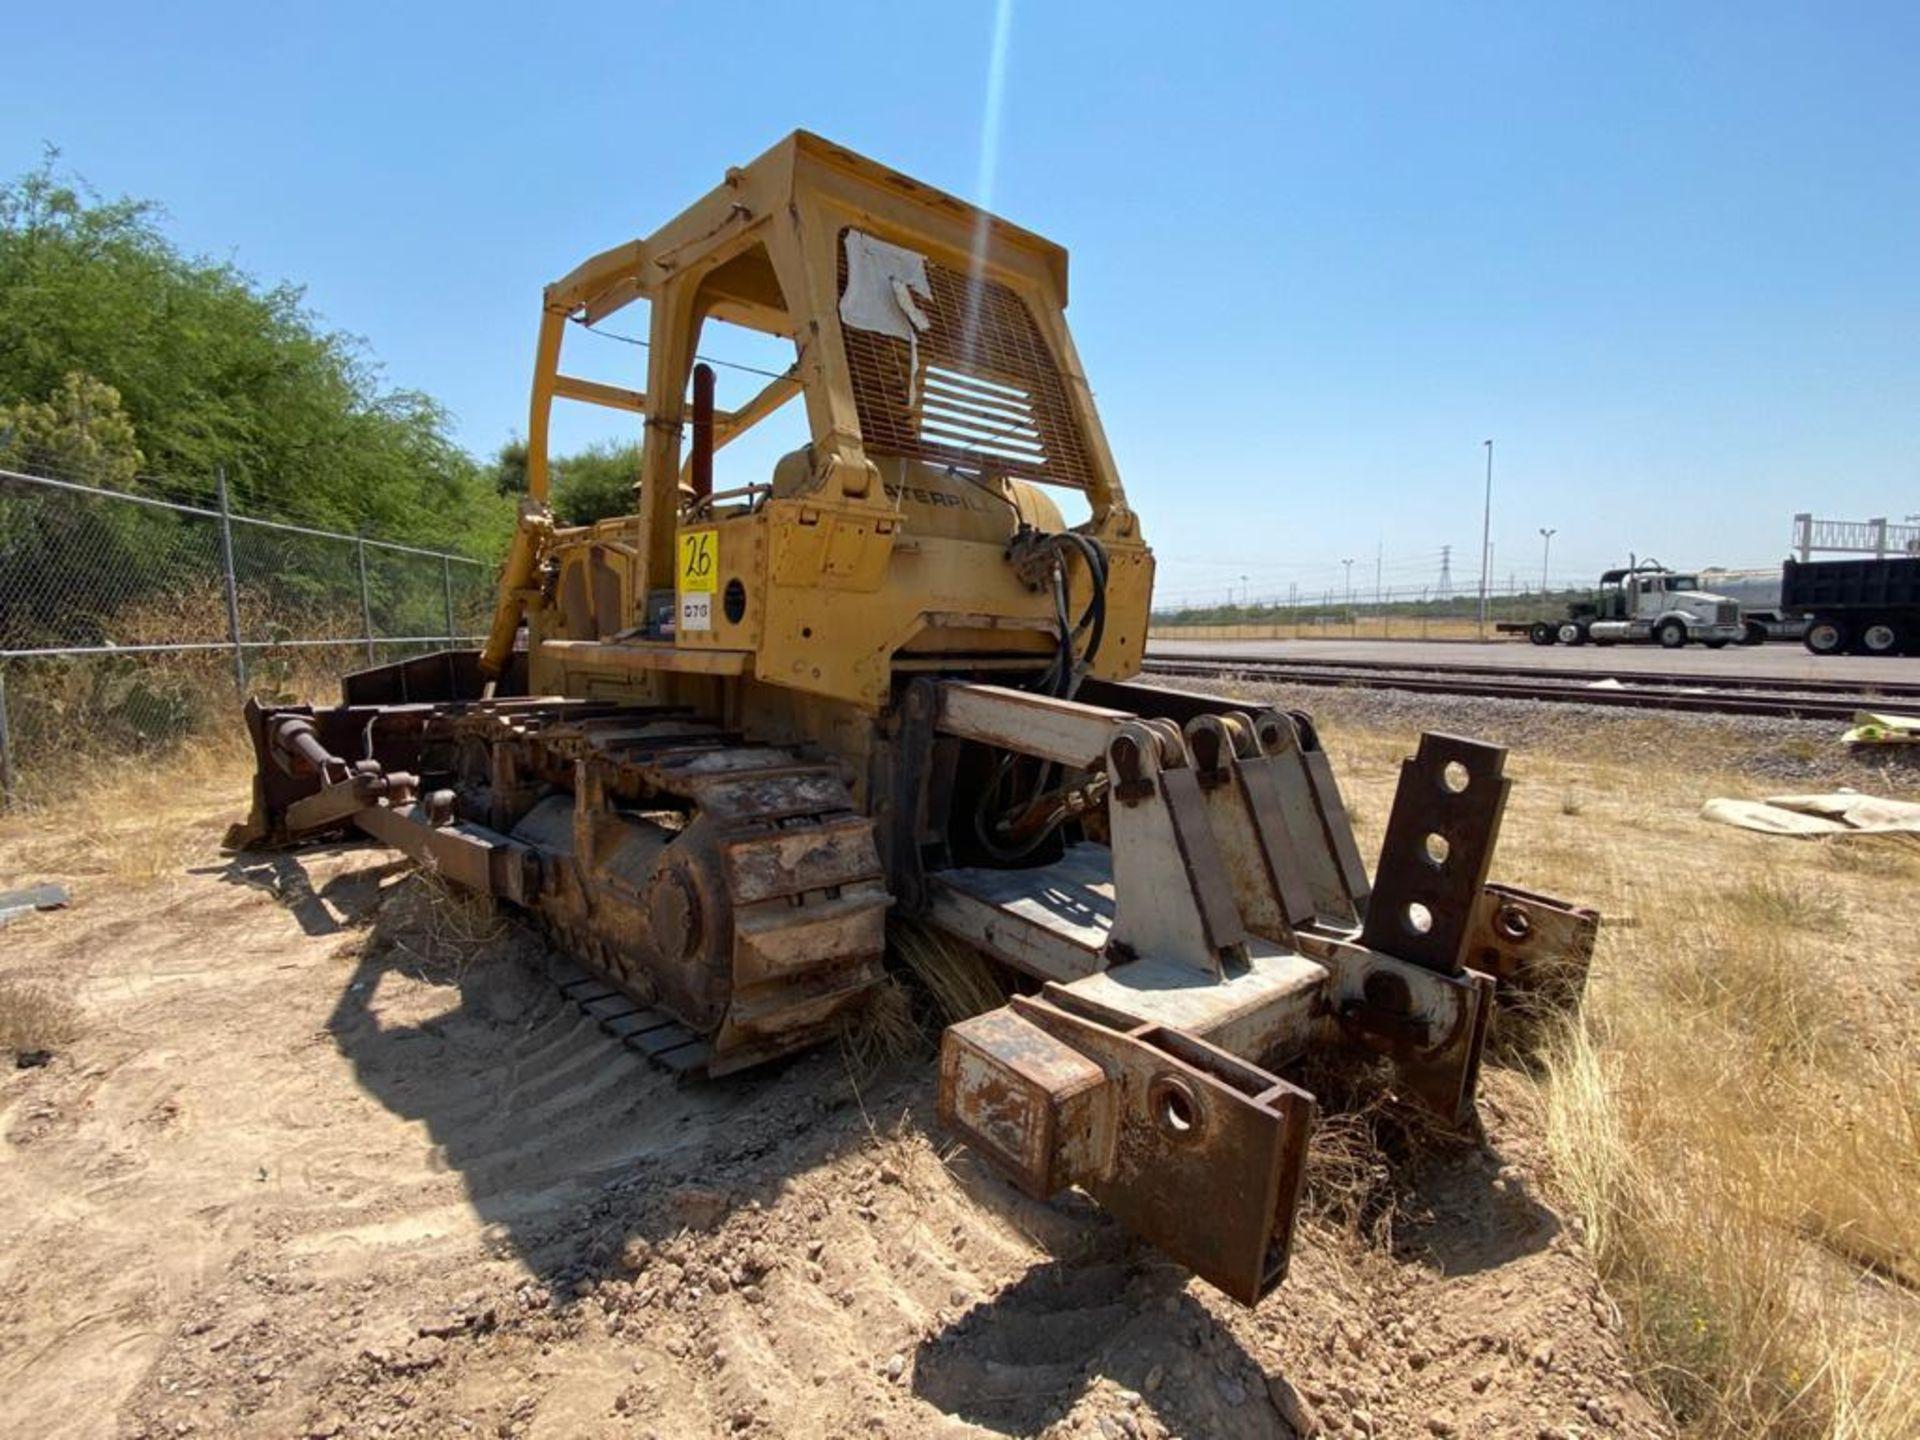 Caterpillar D7G Bulldozer, Serial number 92V5897, Diesel motor - Image 10 of 48